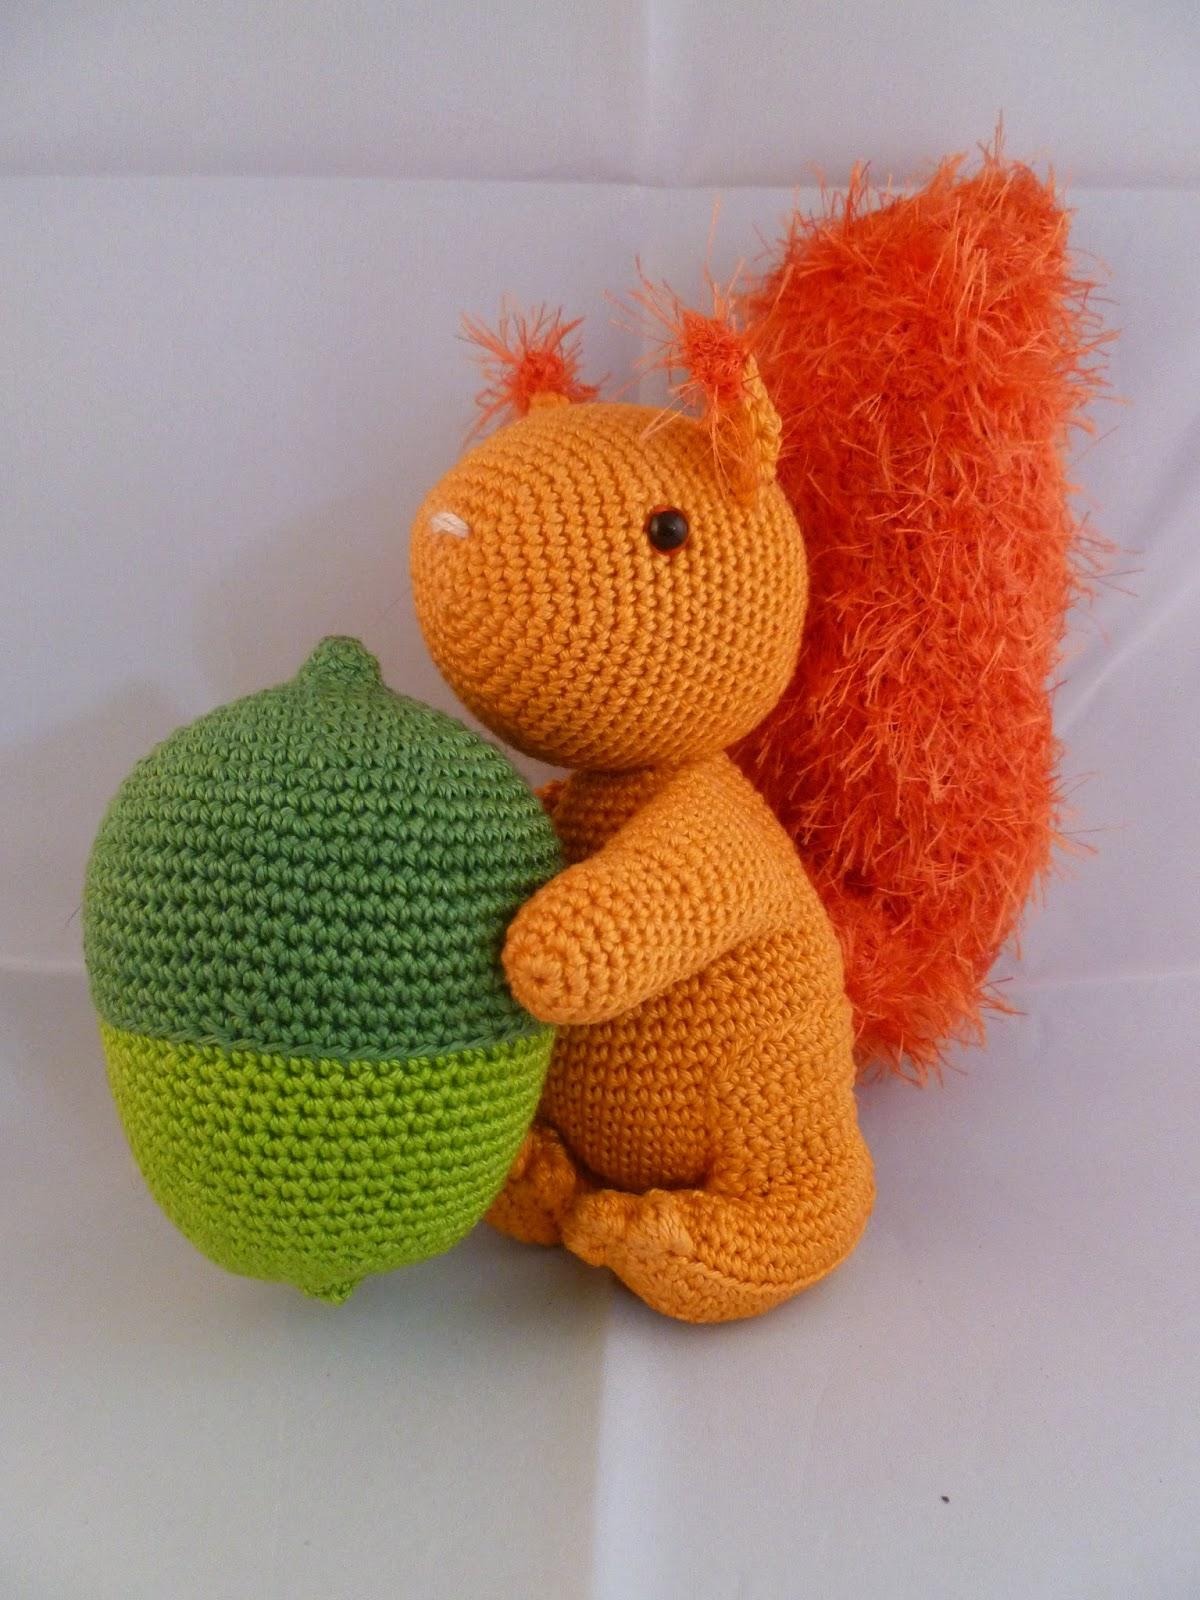 Annes Crochet Palace Kort Overzicht Gemaakte Kleine Knuffels 2013